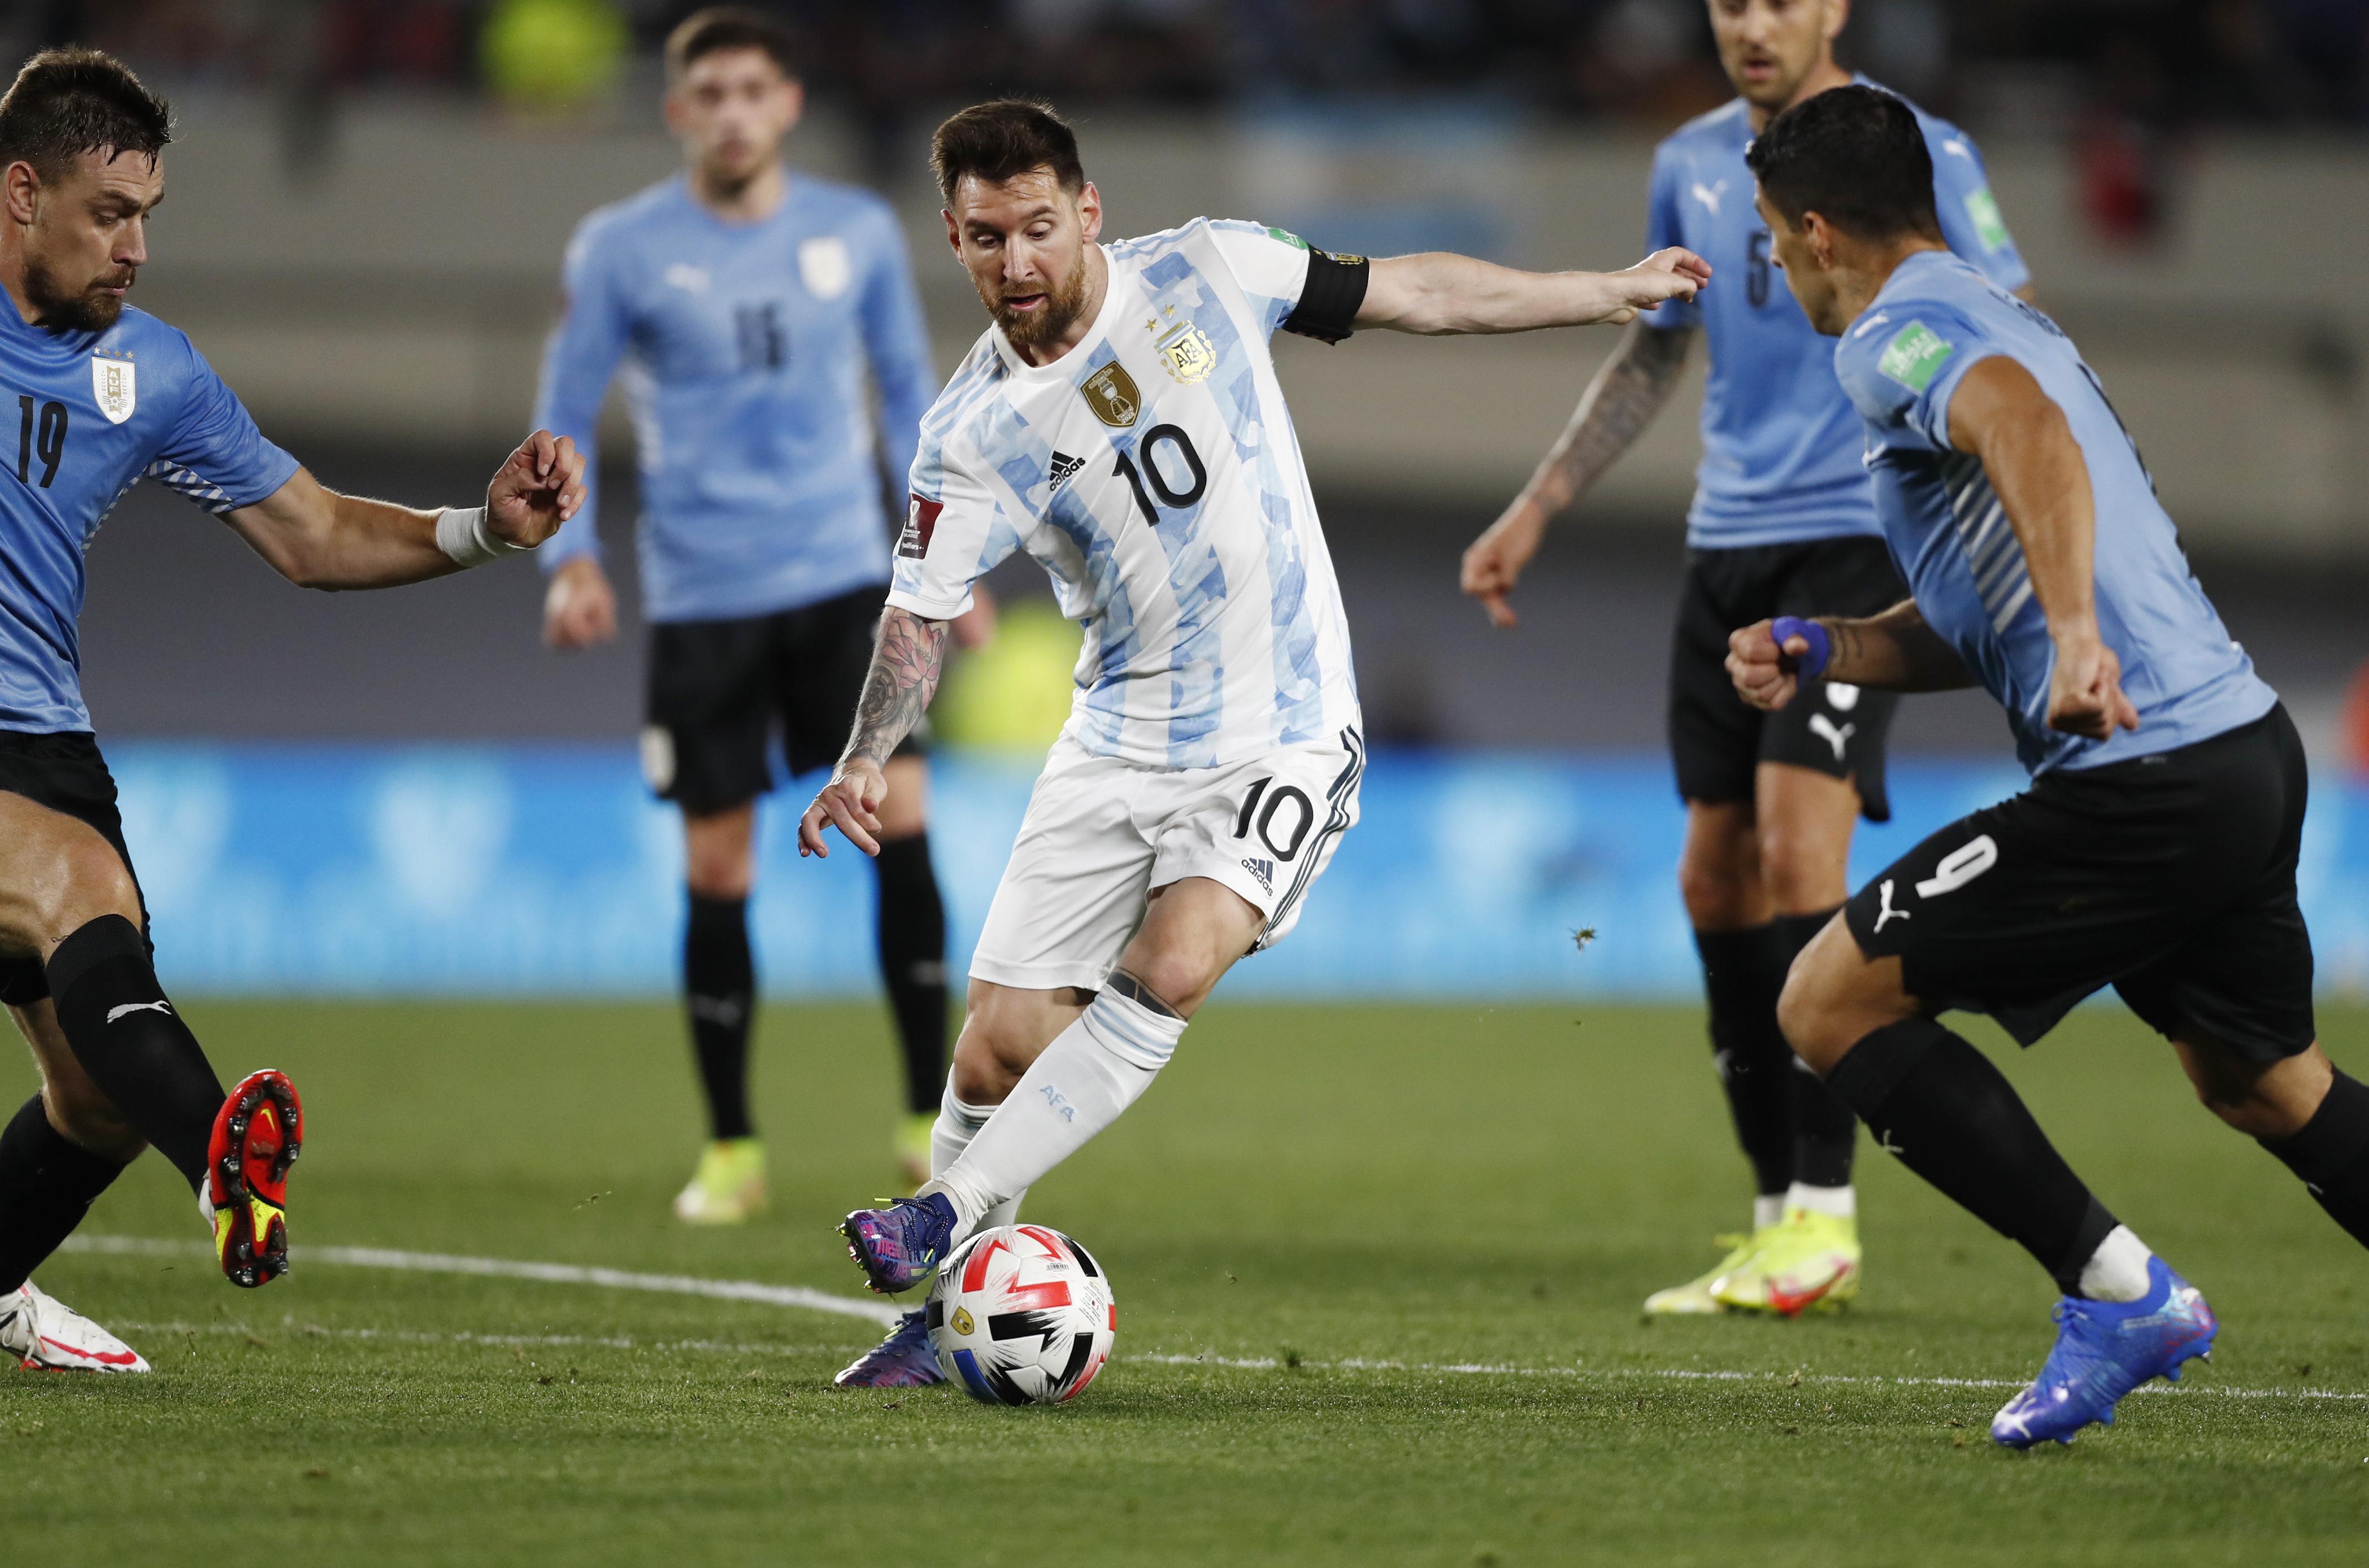 Ballon d'Or 2021 predictions- Who has a chance to win football's most prestigious prize?